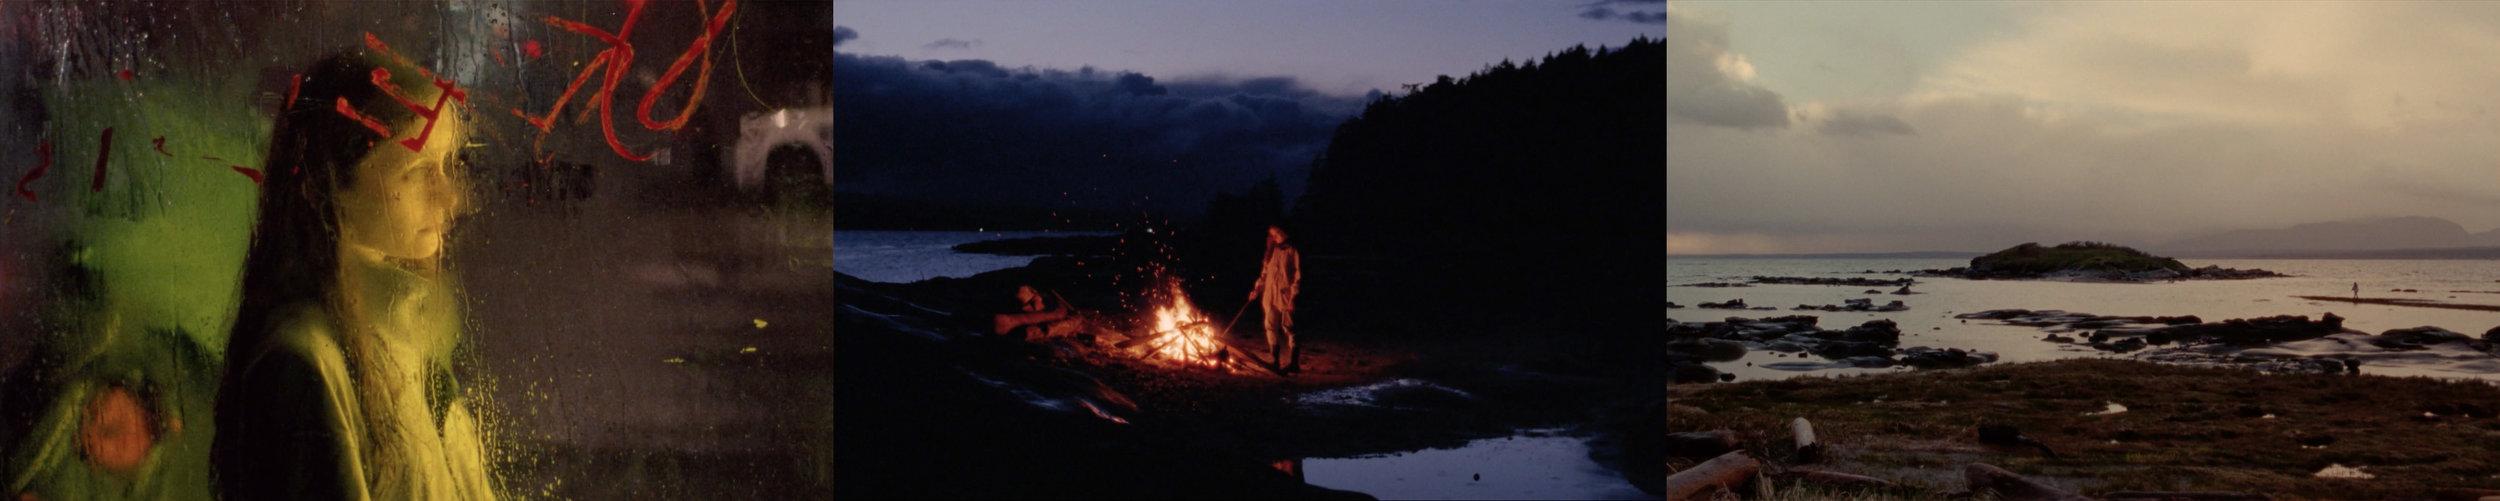 Short Film  'The Glow is Gone' dir. Ryan Ermacora